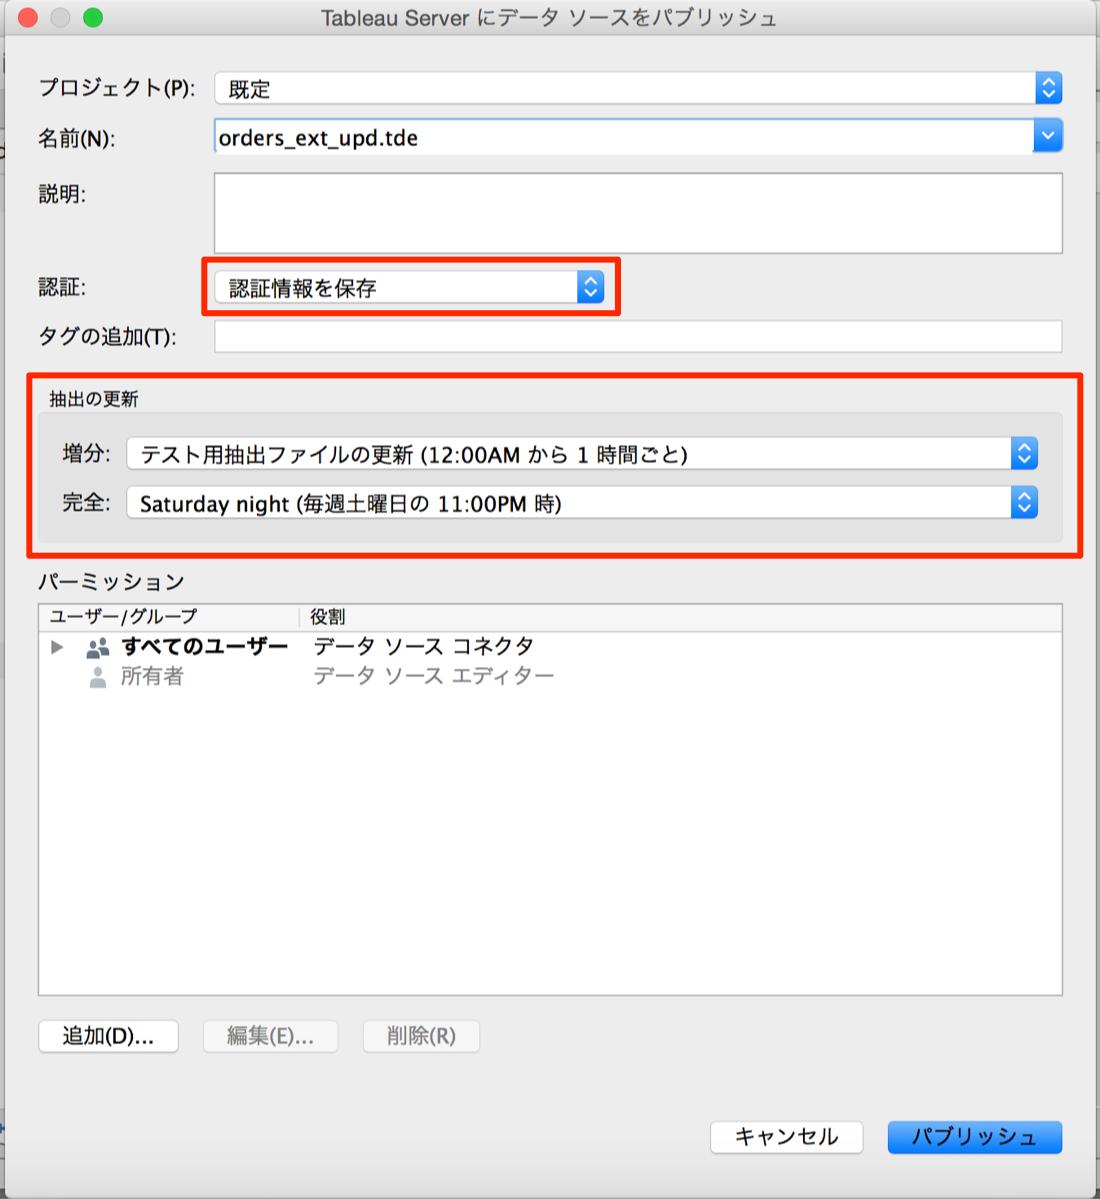 tableau-server-schedule-extract_14